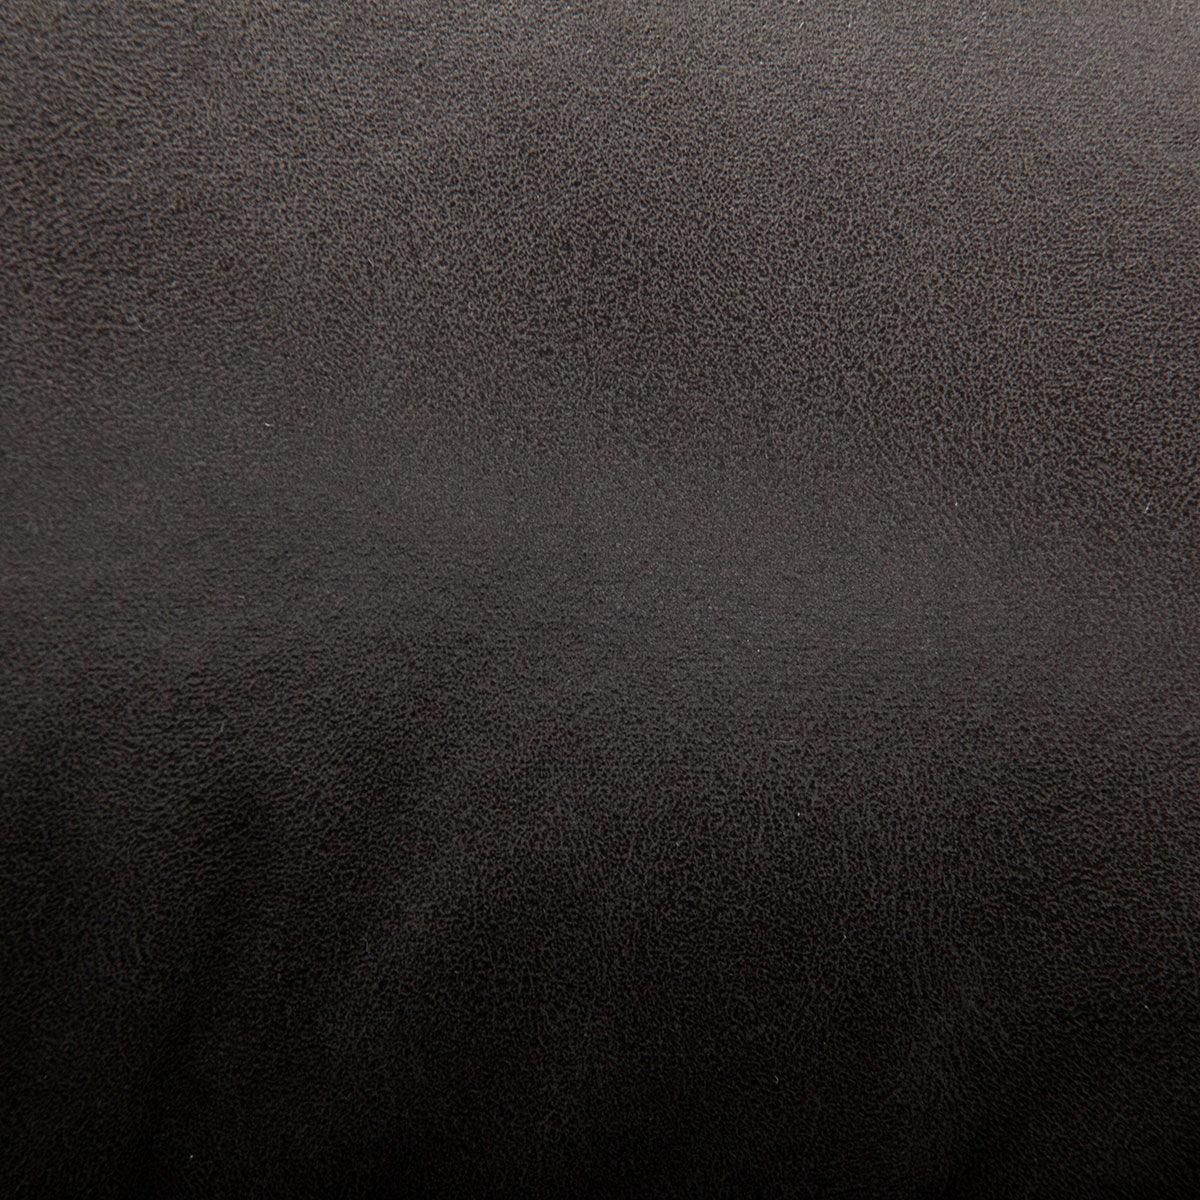 Picture of REYNOLDS HI LEG RECLINER W/ POWER HEADREST